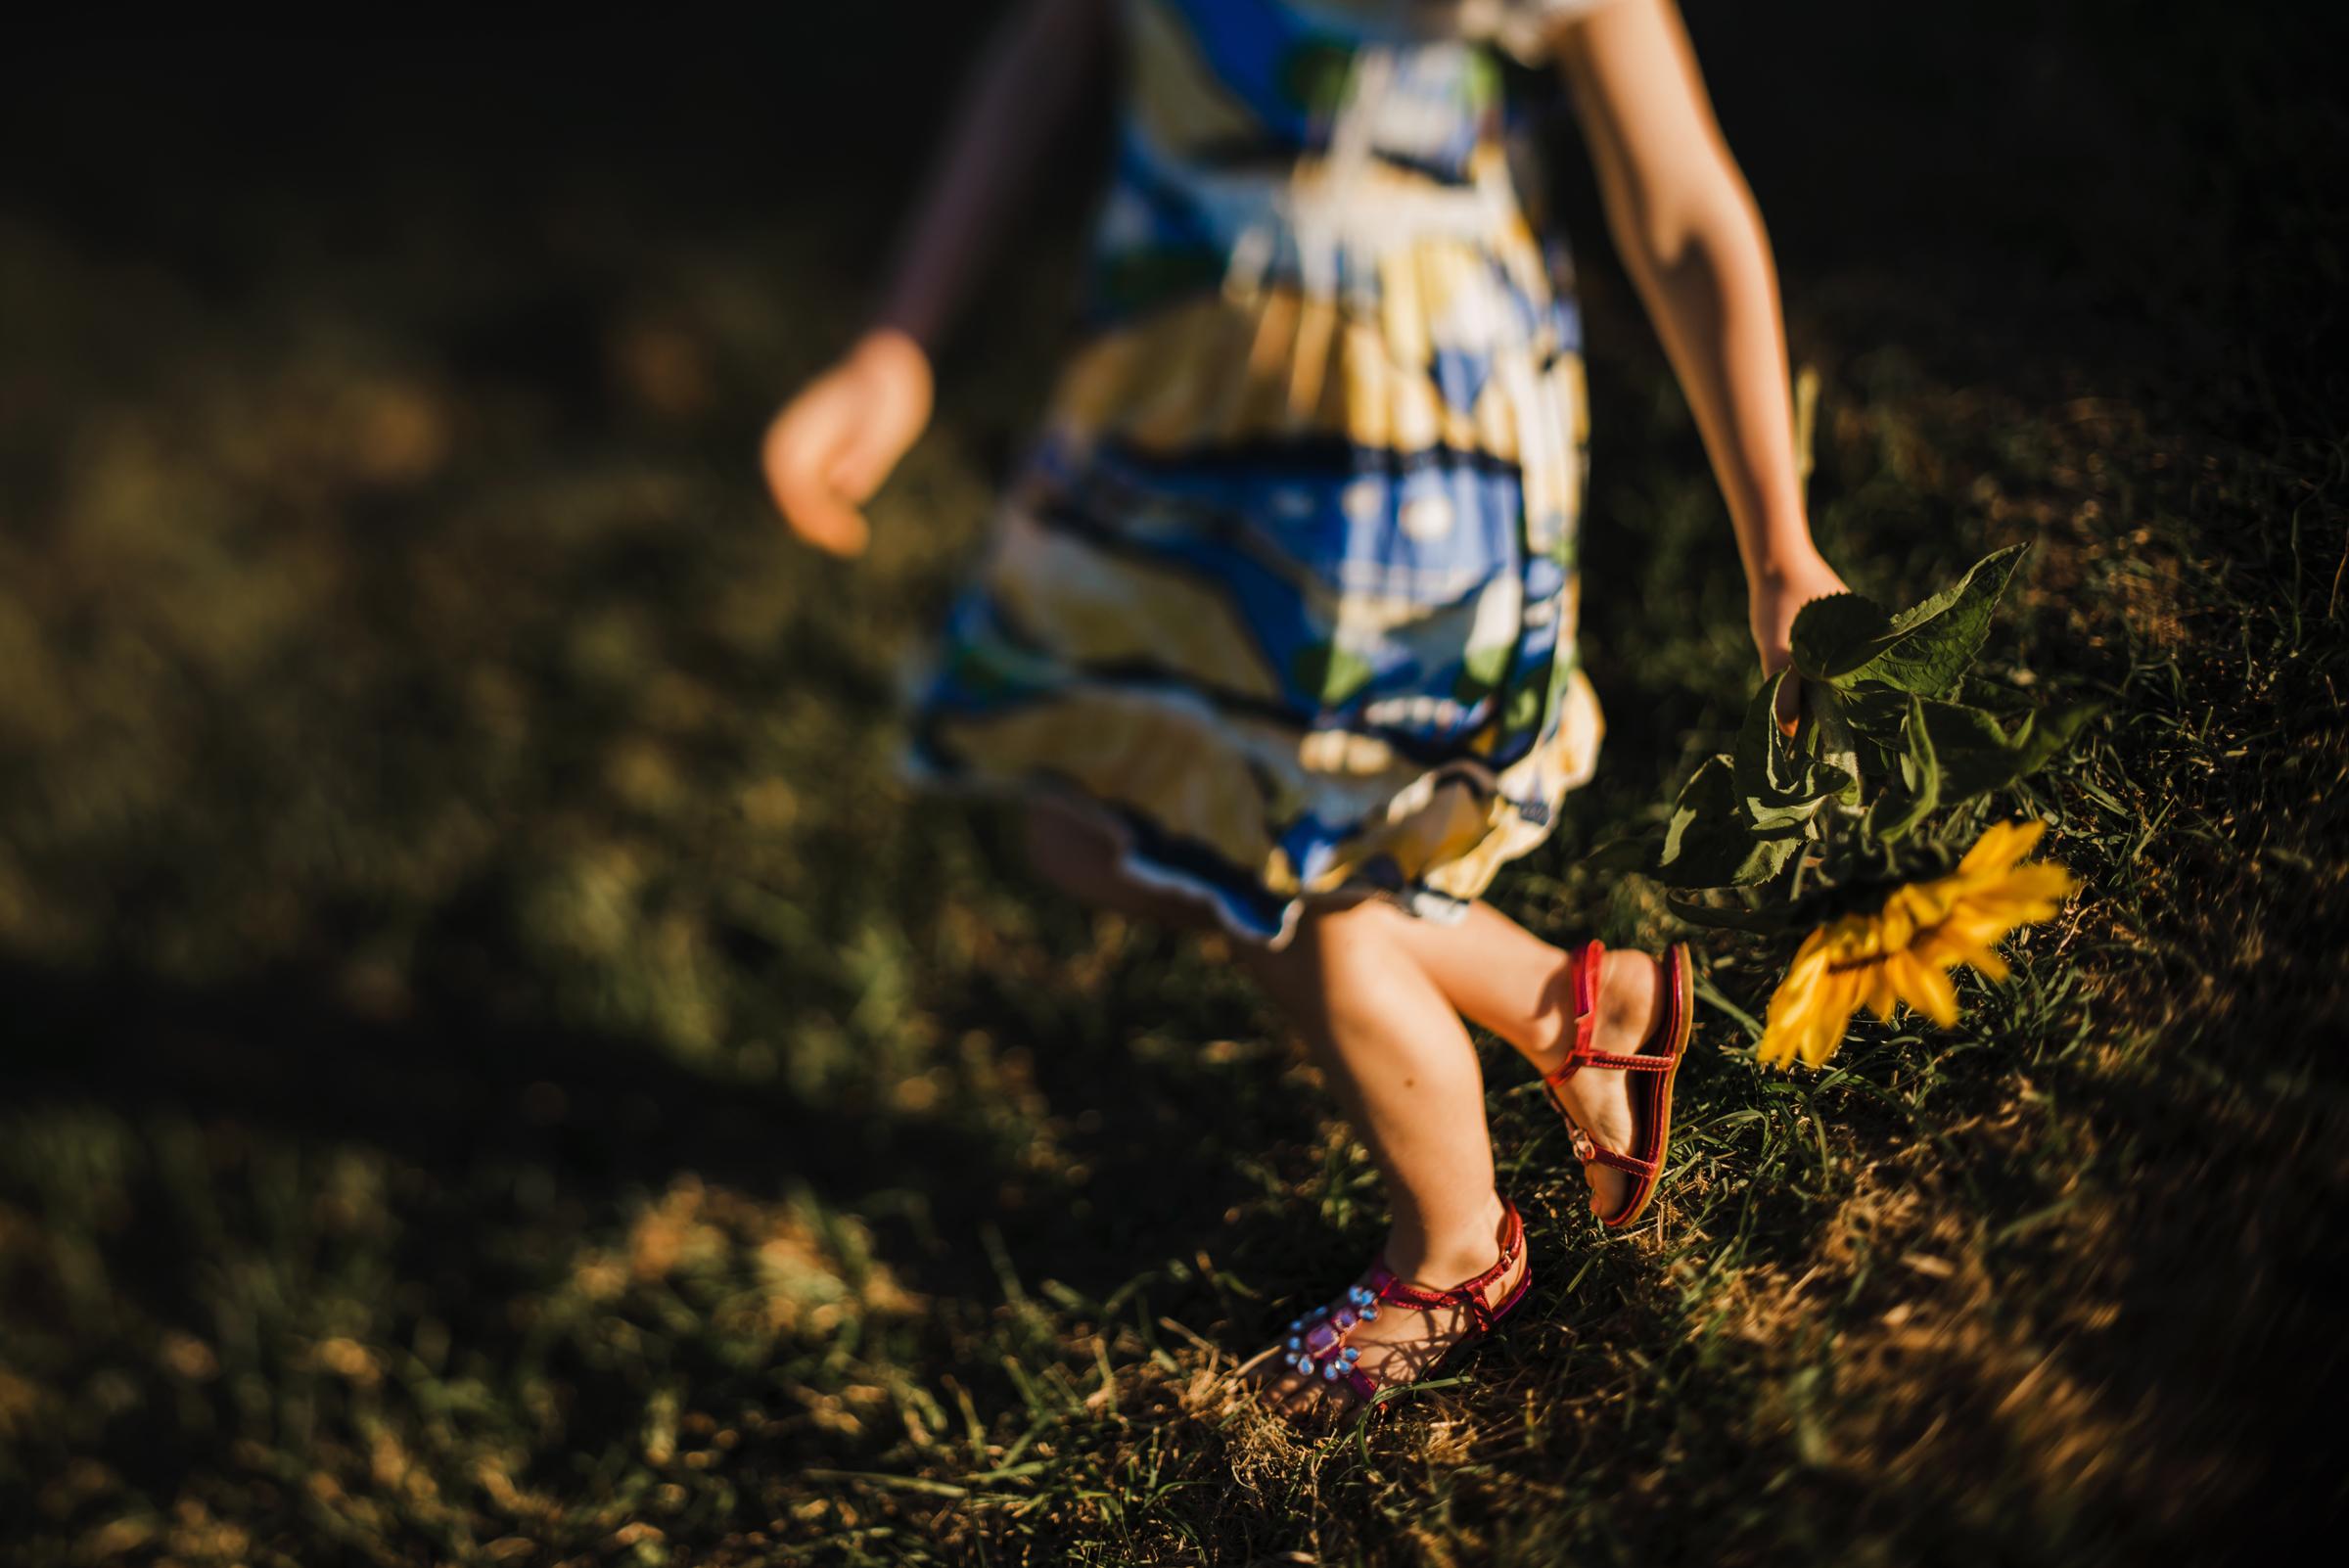 dancing_feet_with_sunflower.jpg